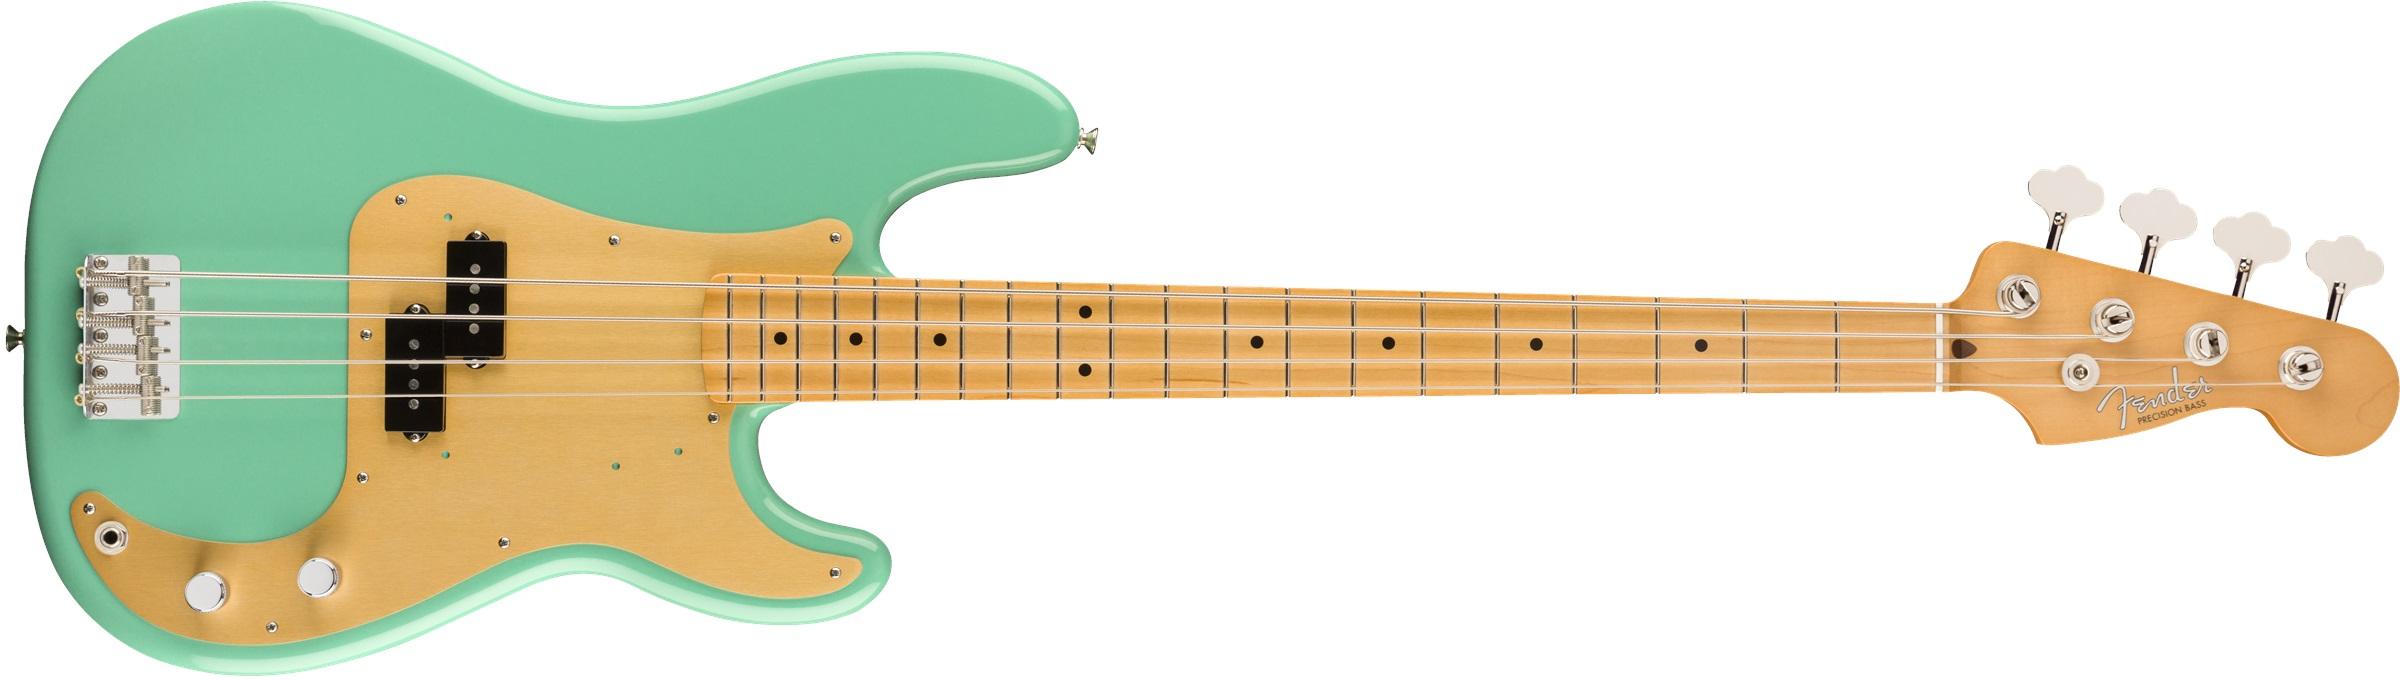 Fender Vintera '50s Precision Bass®, Maple Fingerboard, Sea Foam Green